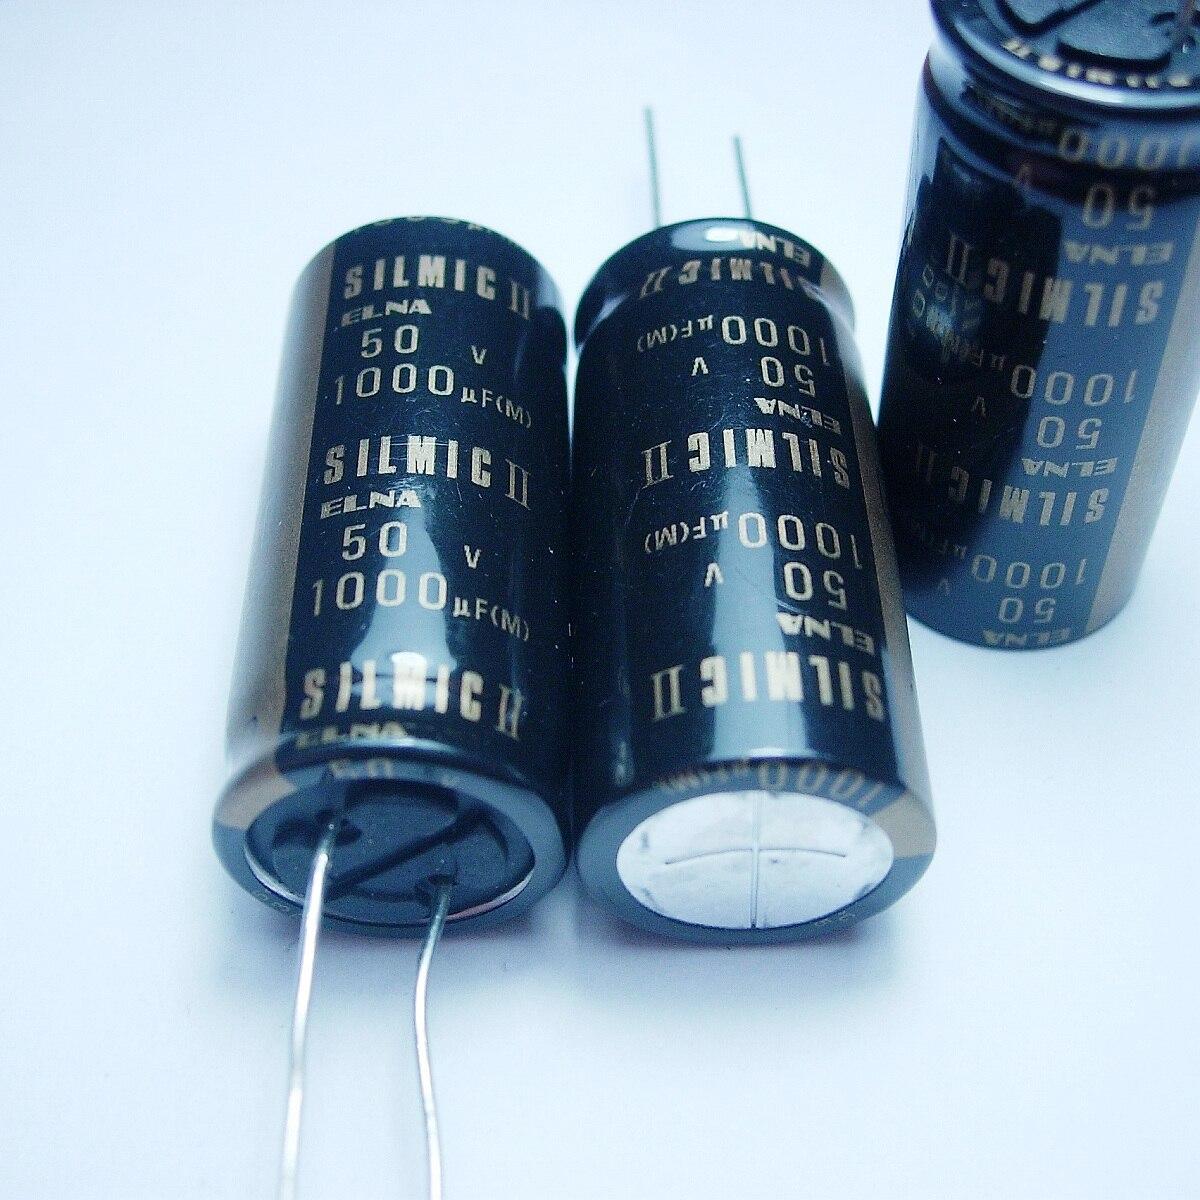 5pcs/10pcs ELNA SILMCII 50v1000uf 18*40 copper capacitor audio super capacitor electrolytic capacitors free shipping 5pcs 10pcs elna silmcii 16v2200uf 18 40 copper capacitor audio super capacitor electrolytic capacitors free shipping